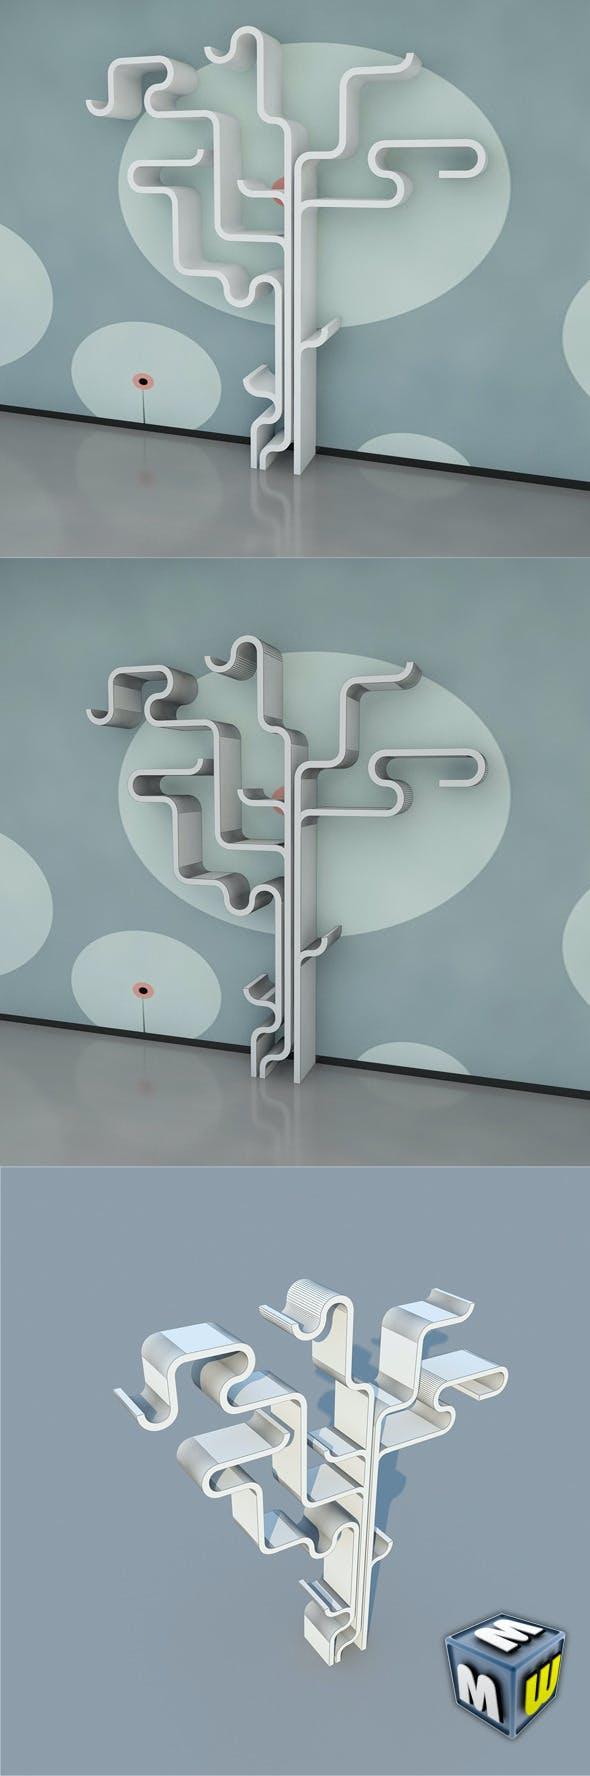 Bookshelf 12 MAX 2011 - 3DOcean Item for Sale